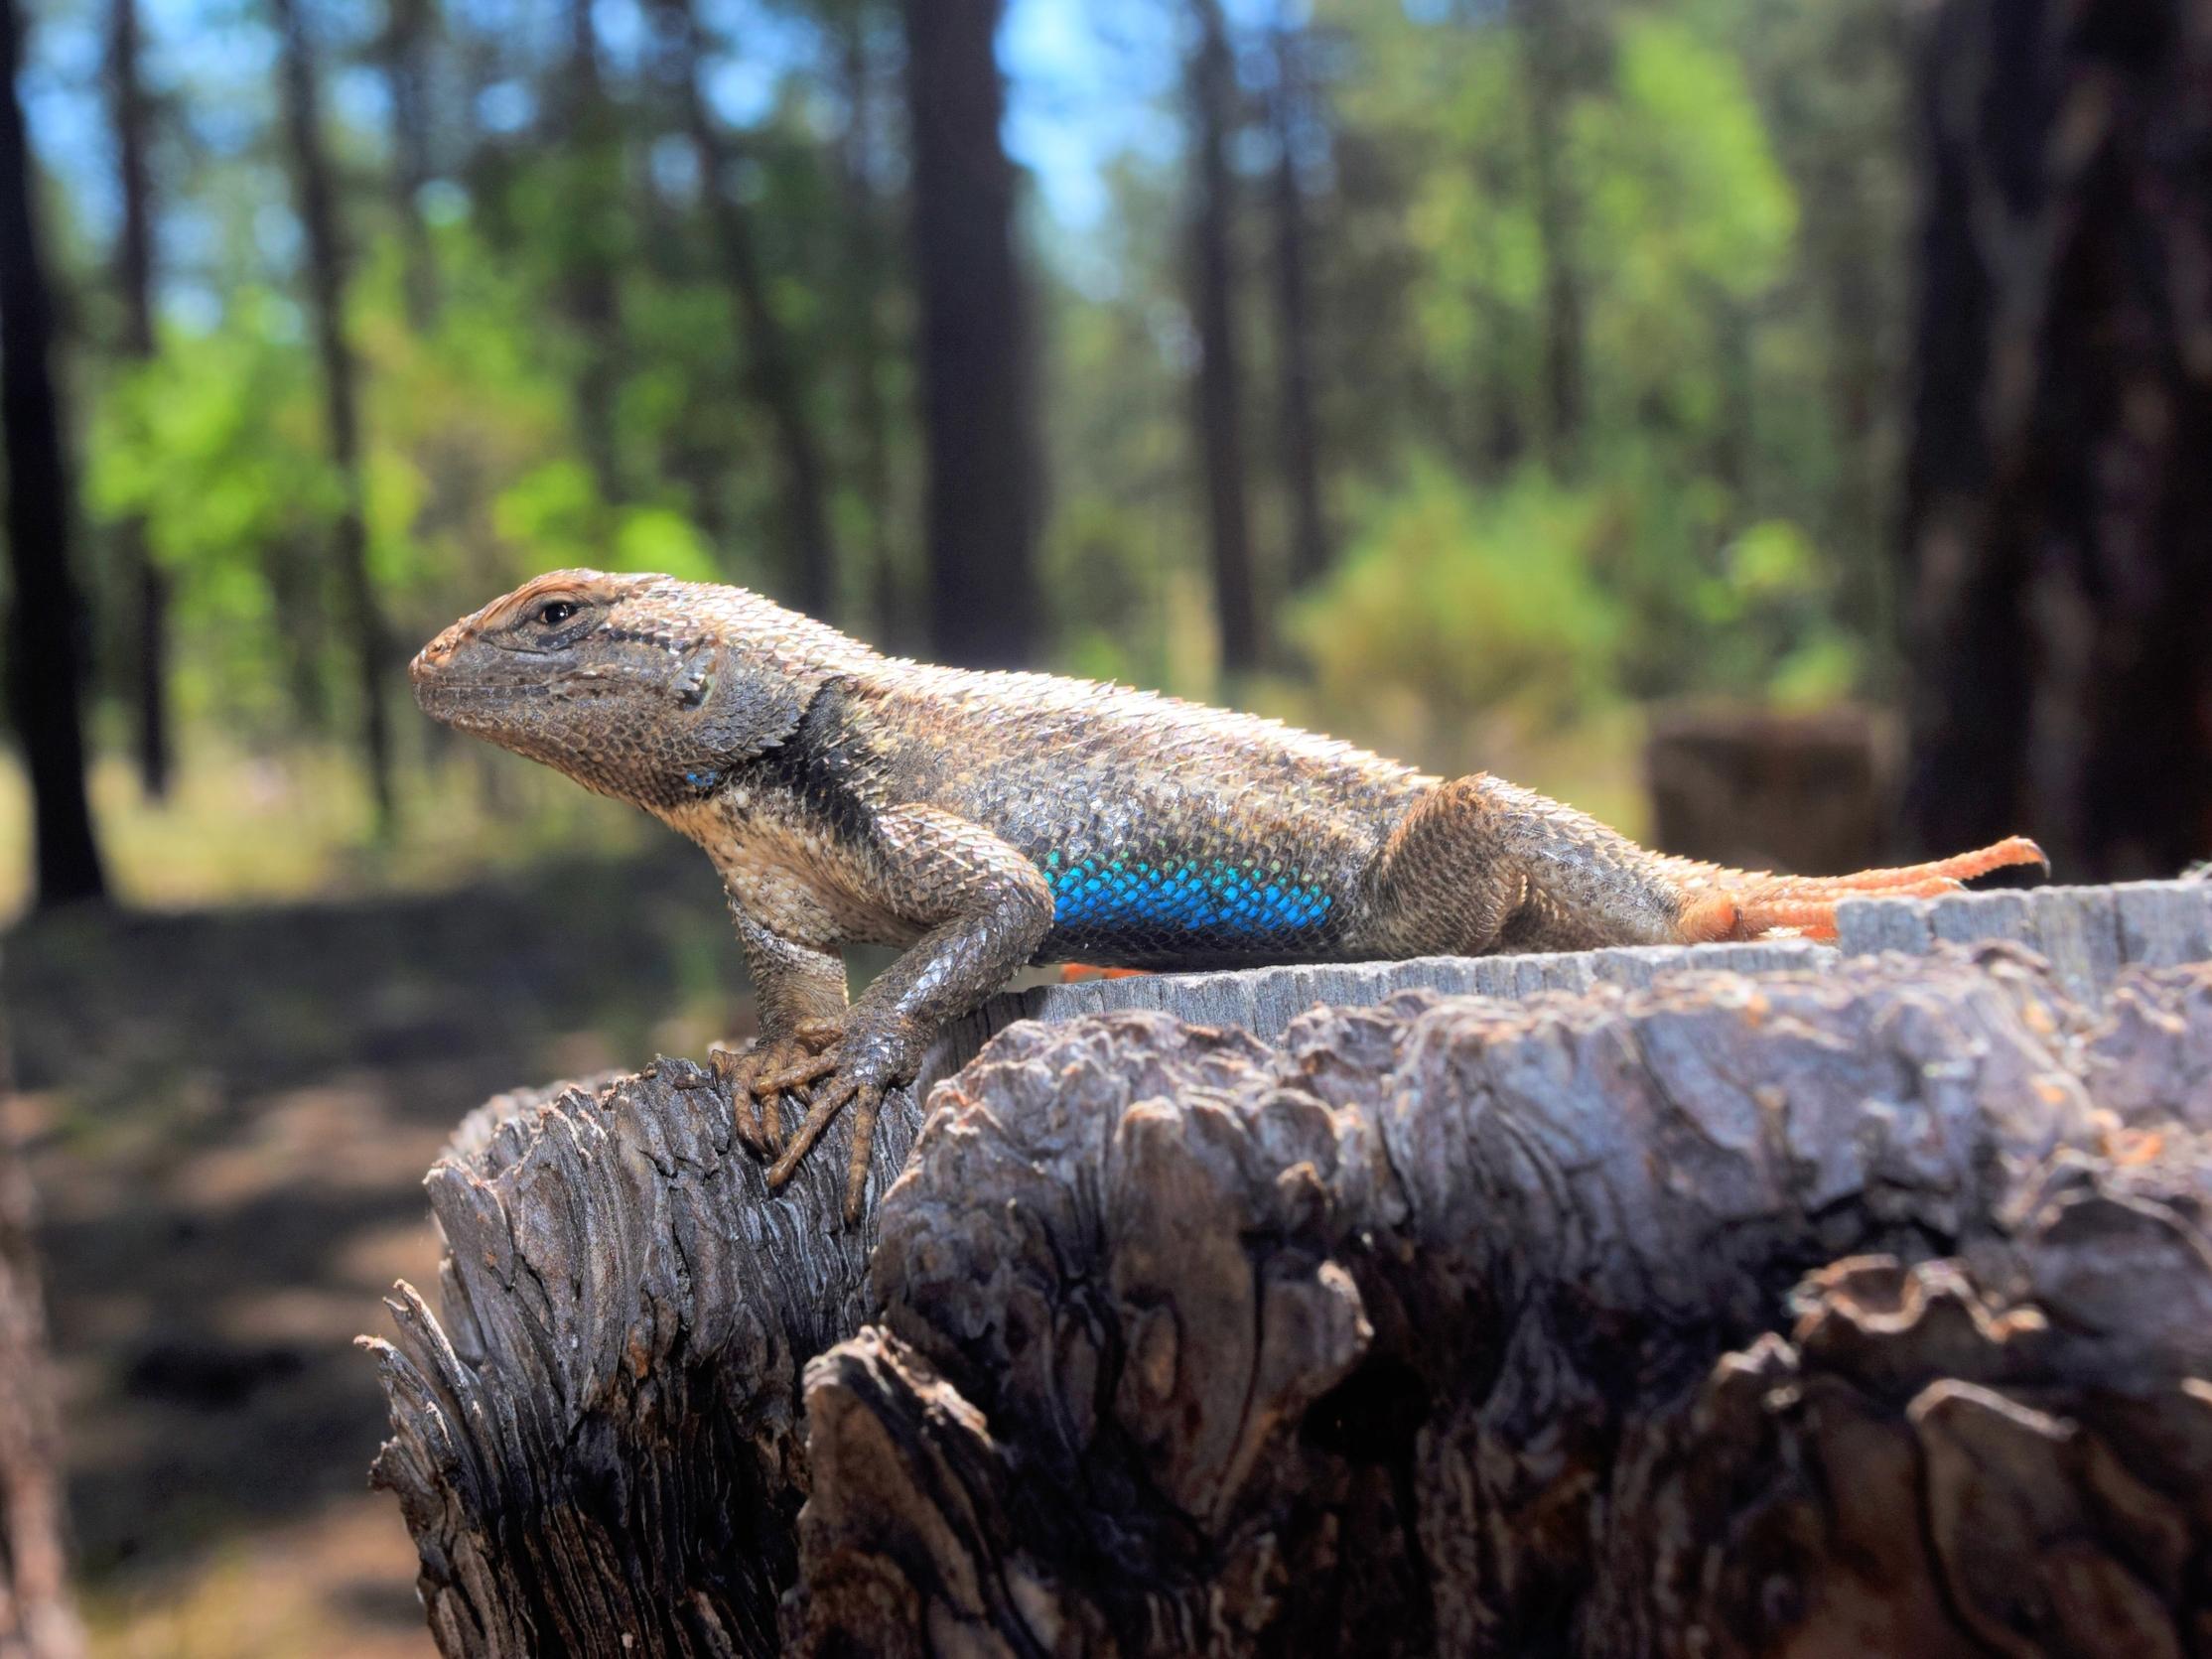 Male plateau fence lizard ( Sceloporus tristichus ). photo credit: A. Camacho